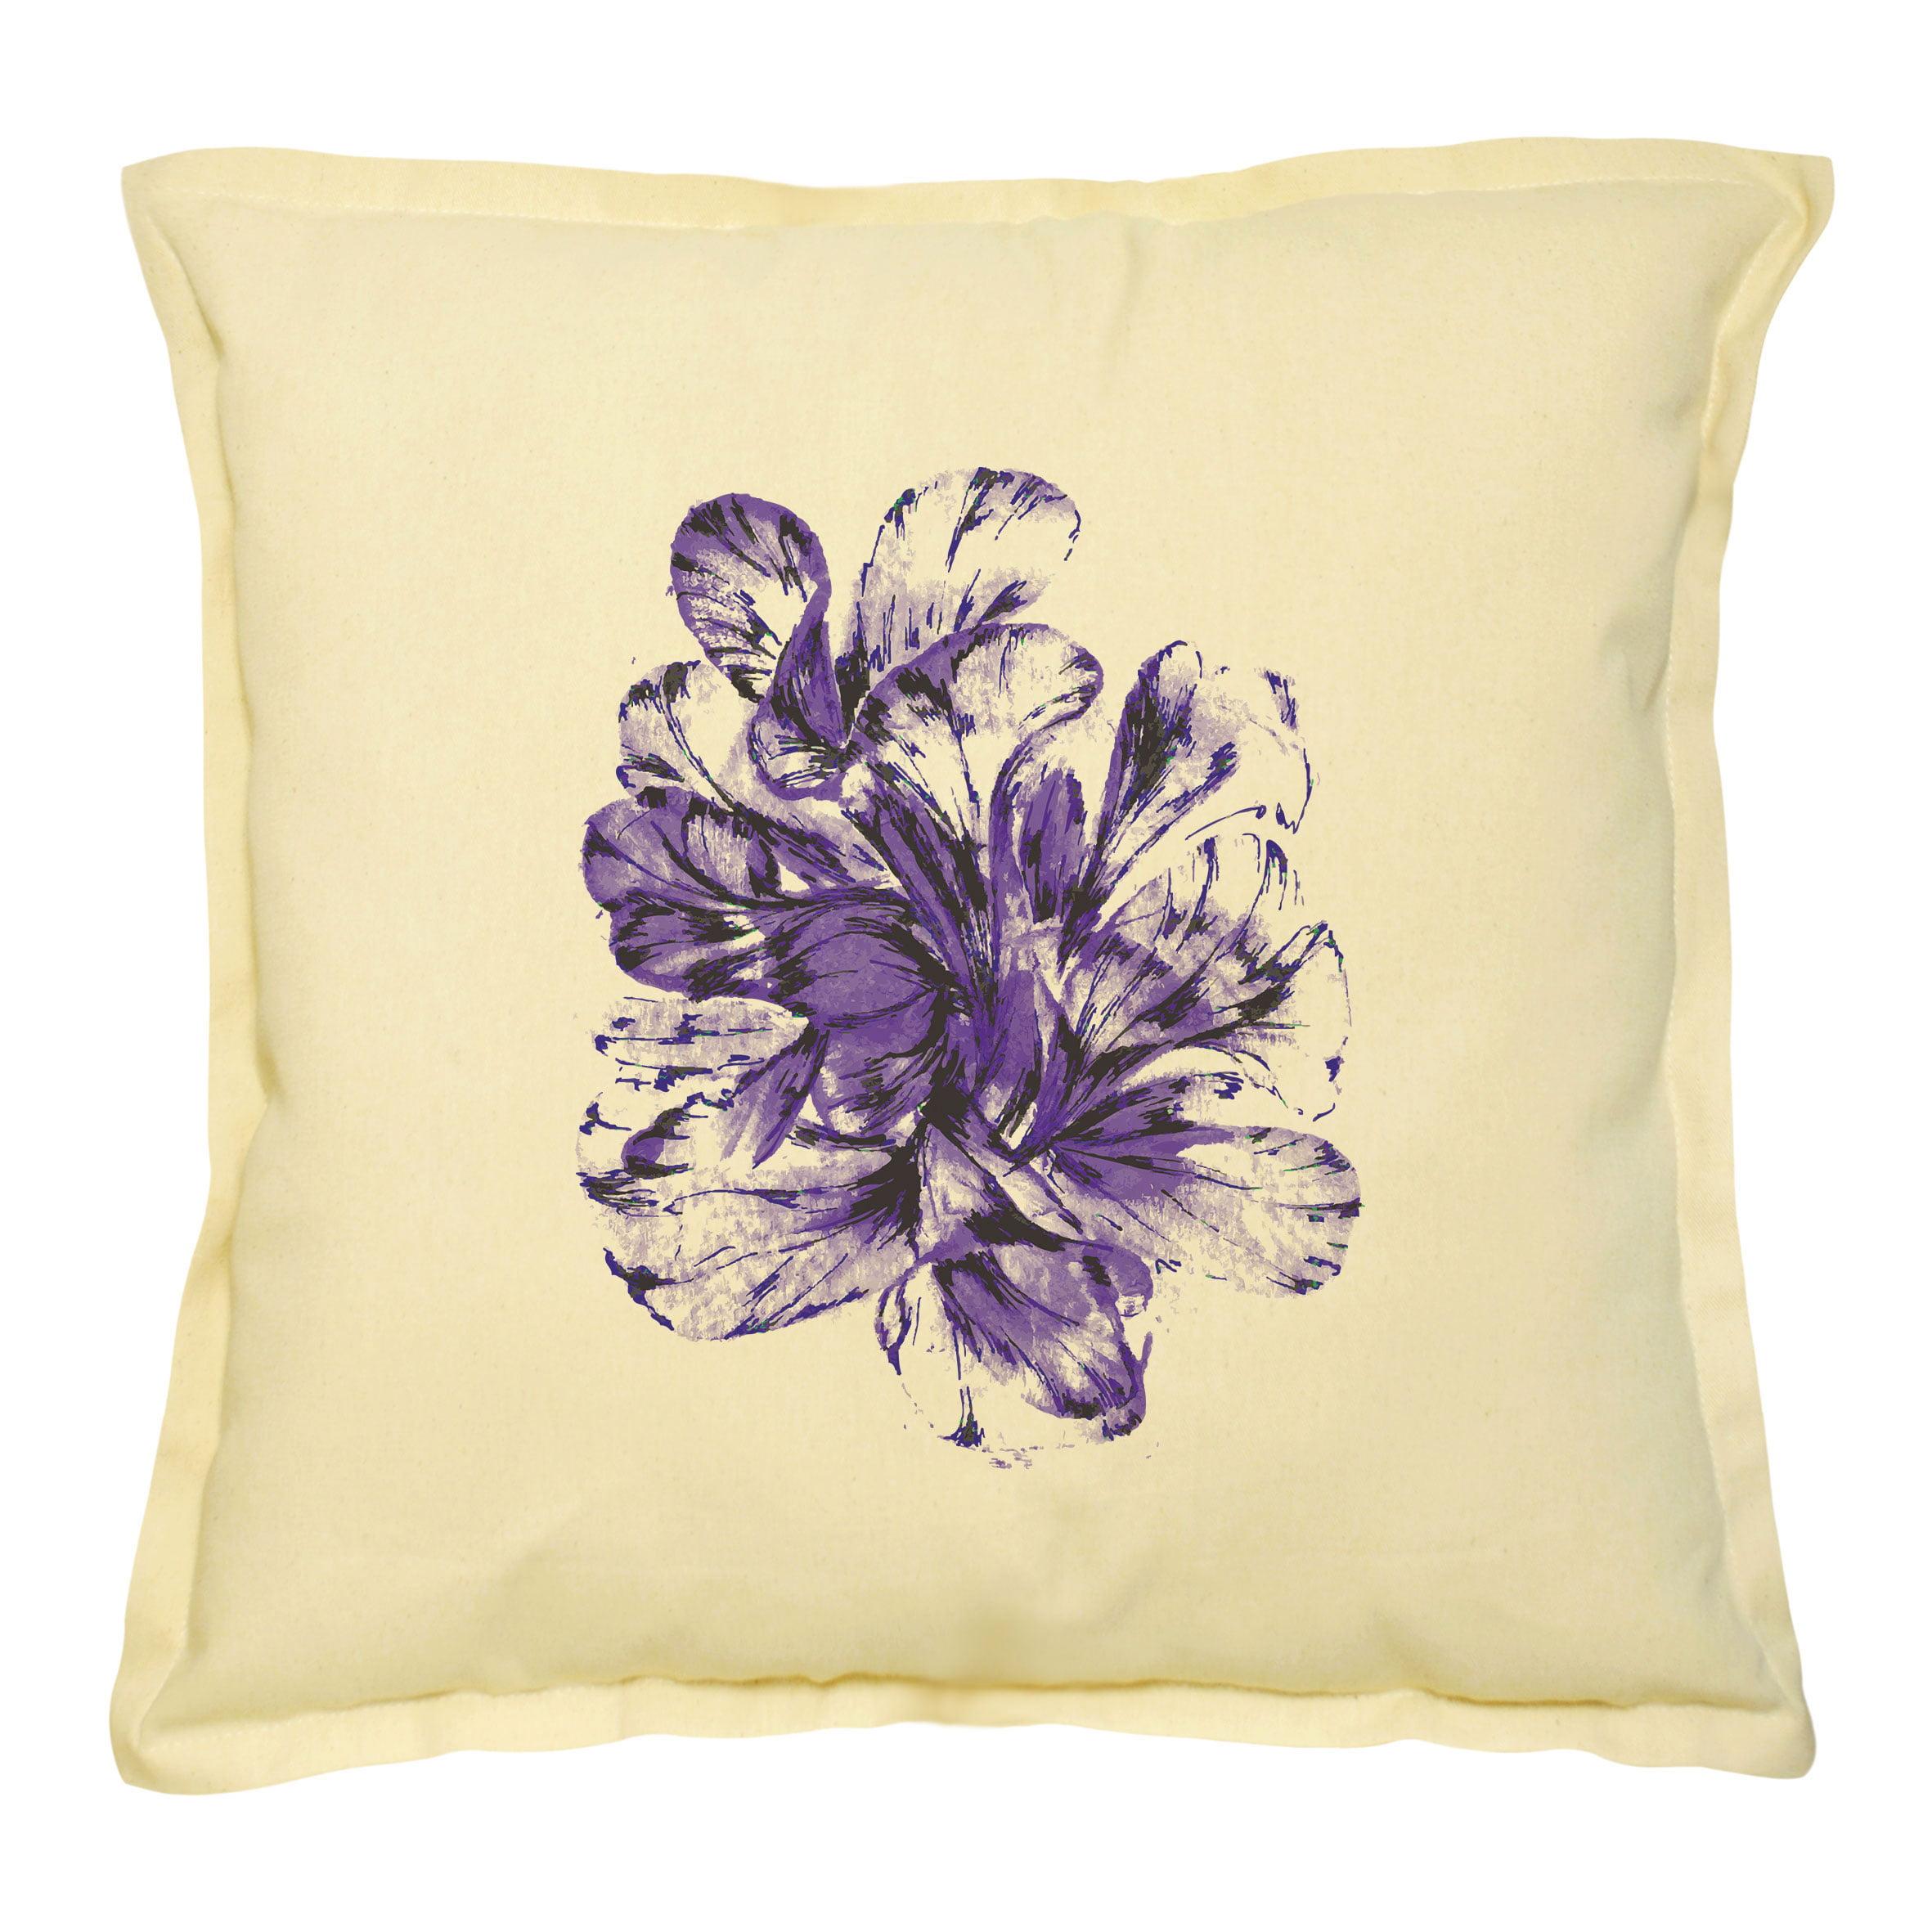 Purple Abstract Flower Printed Khaki Decorative Pillows Case VPLC_02 Size 18x18